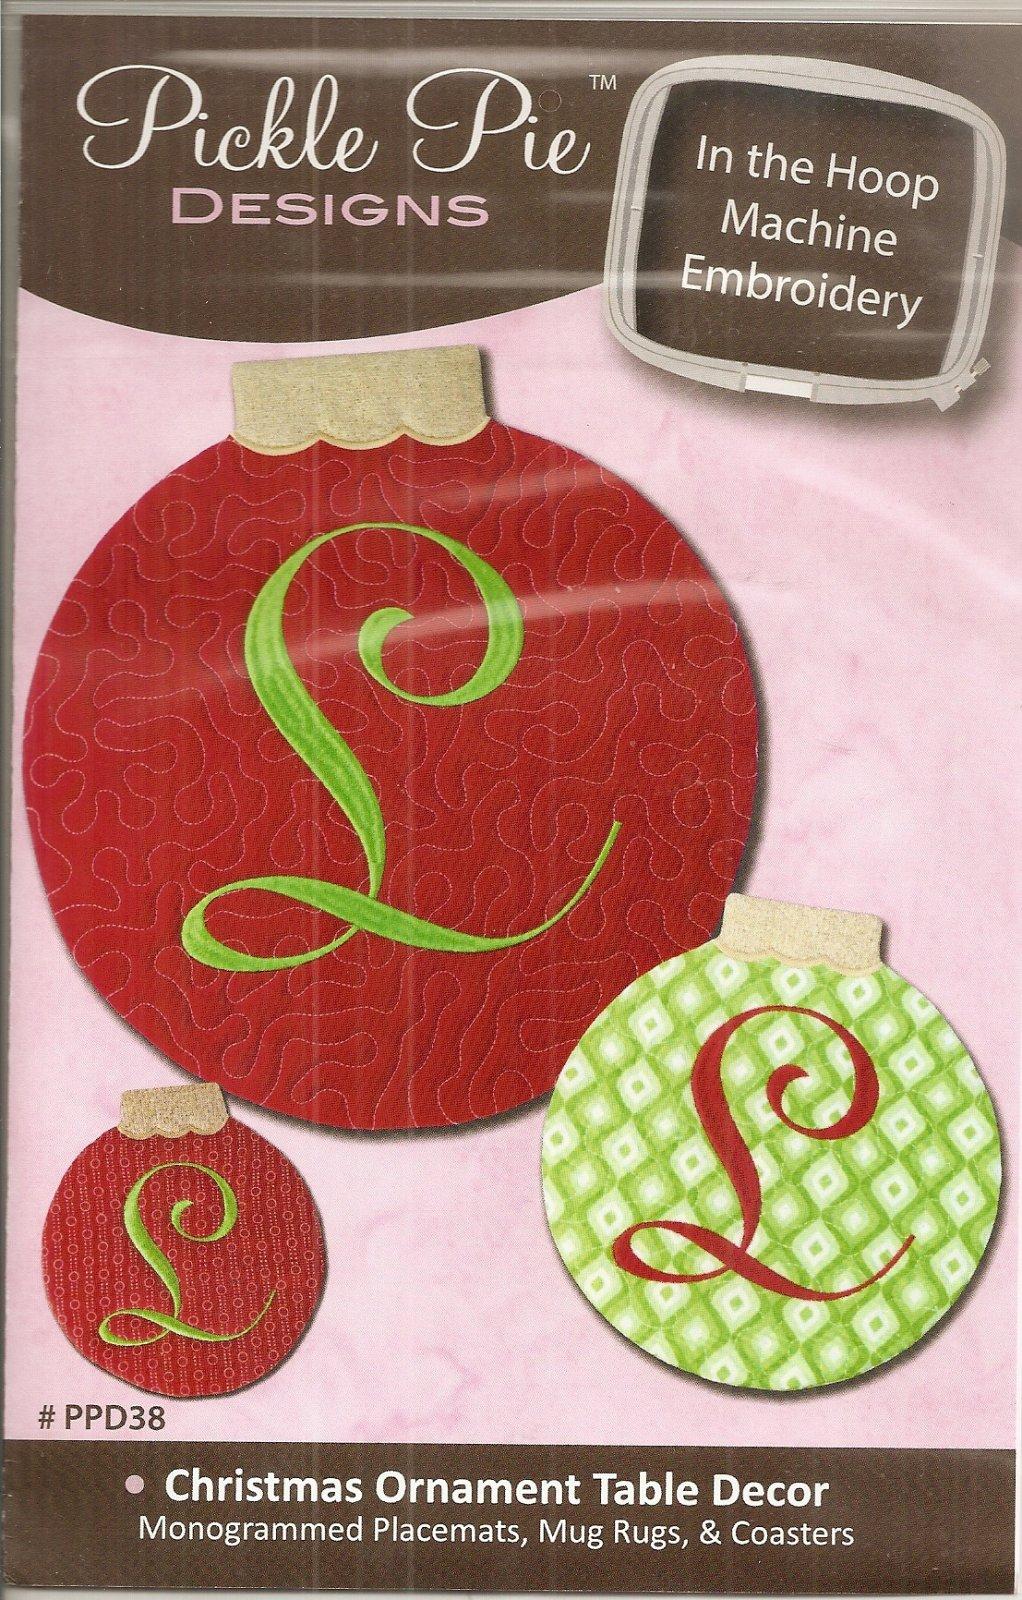 Christmas Ornament Table Decor - 755918143058